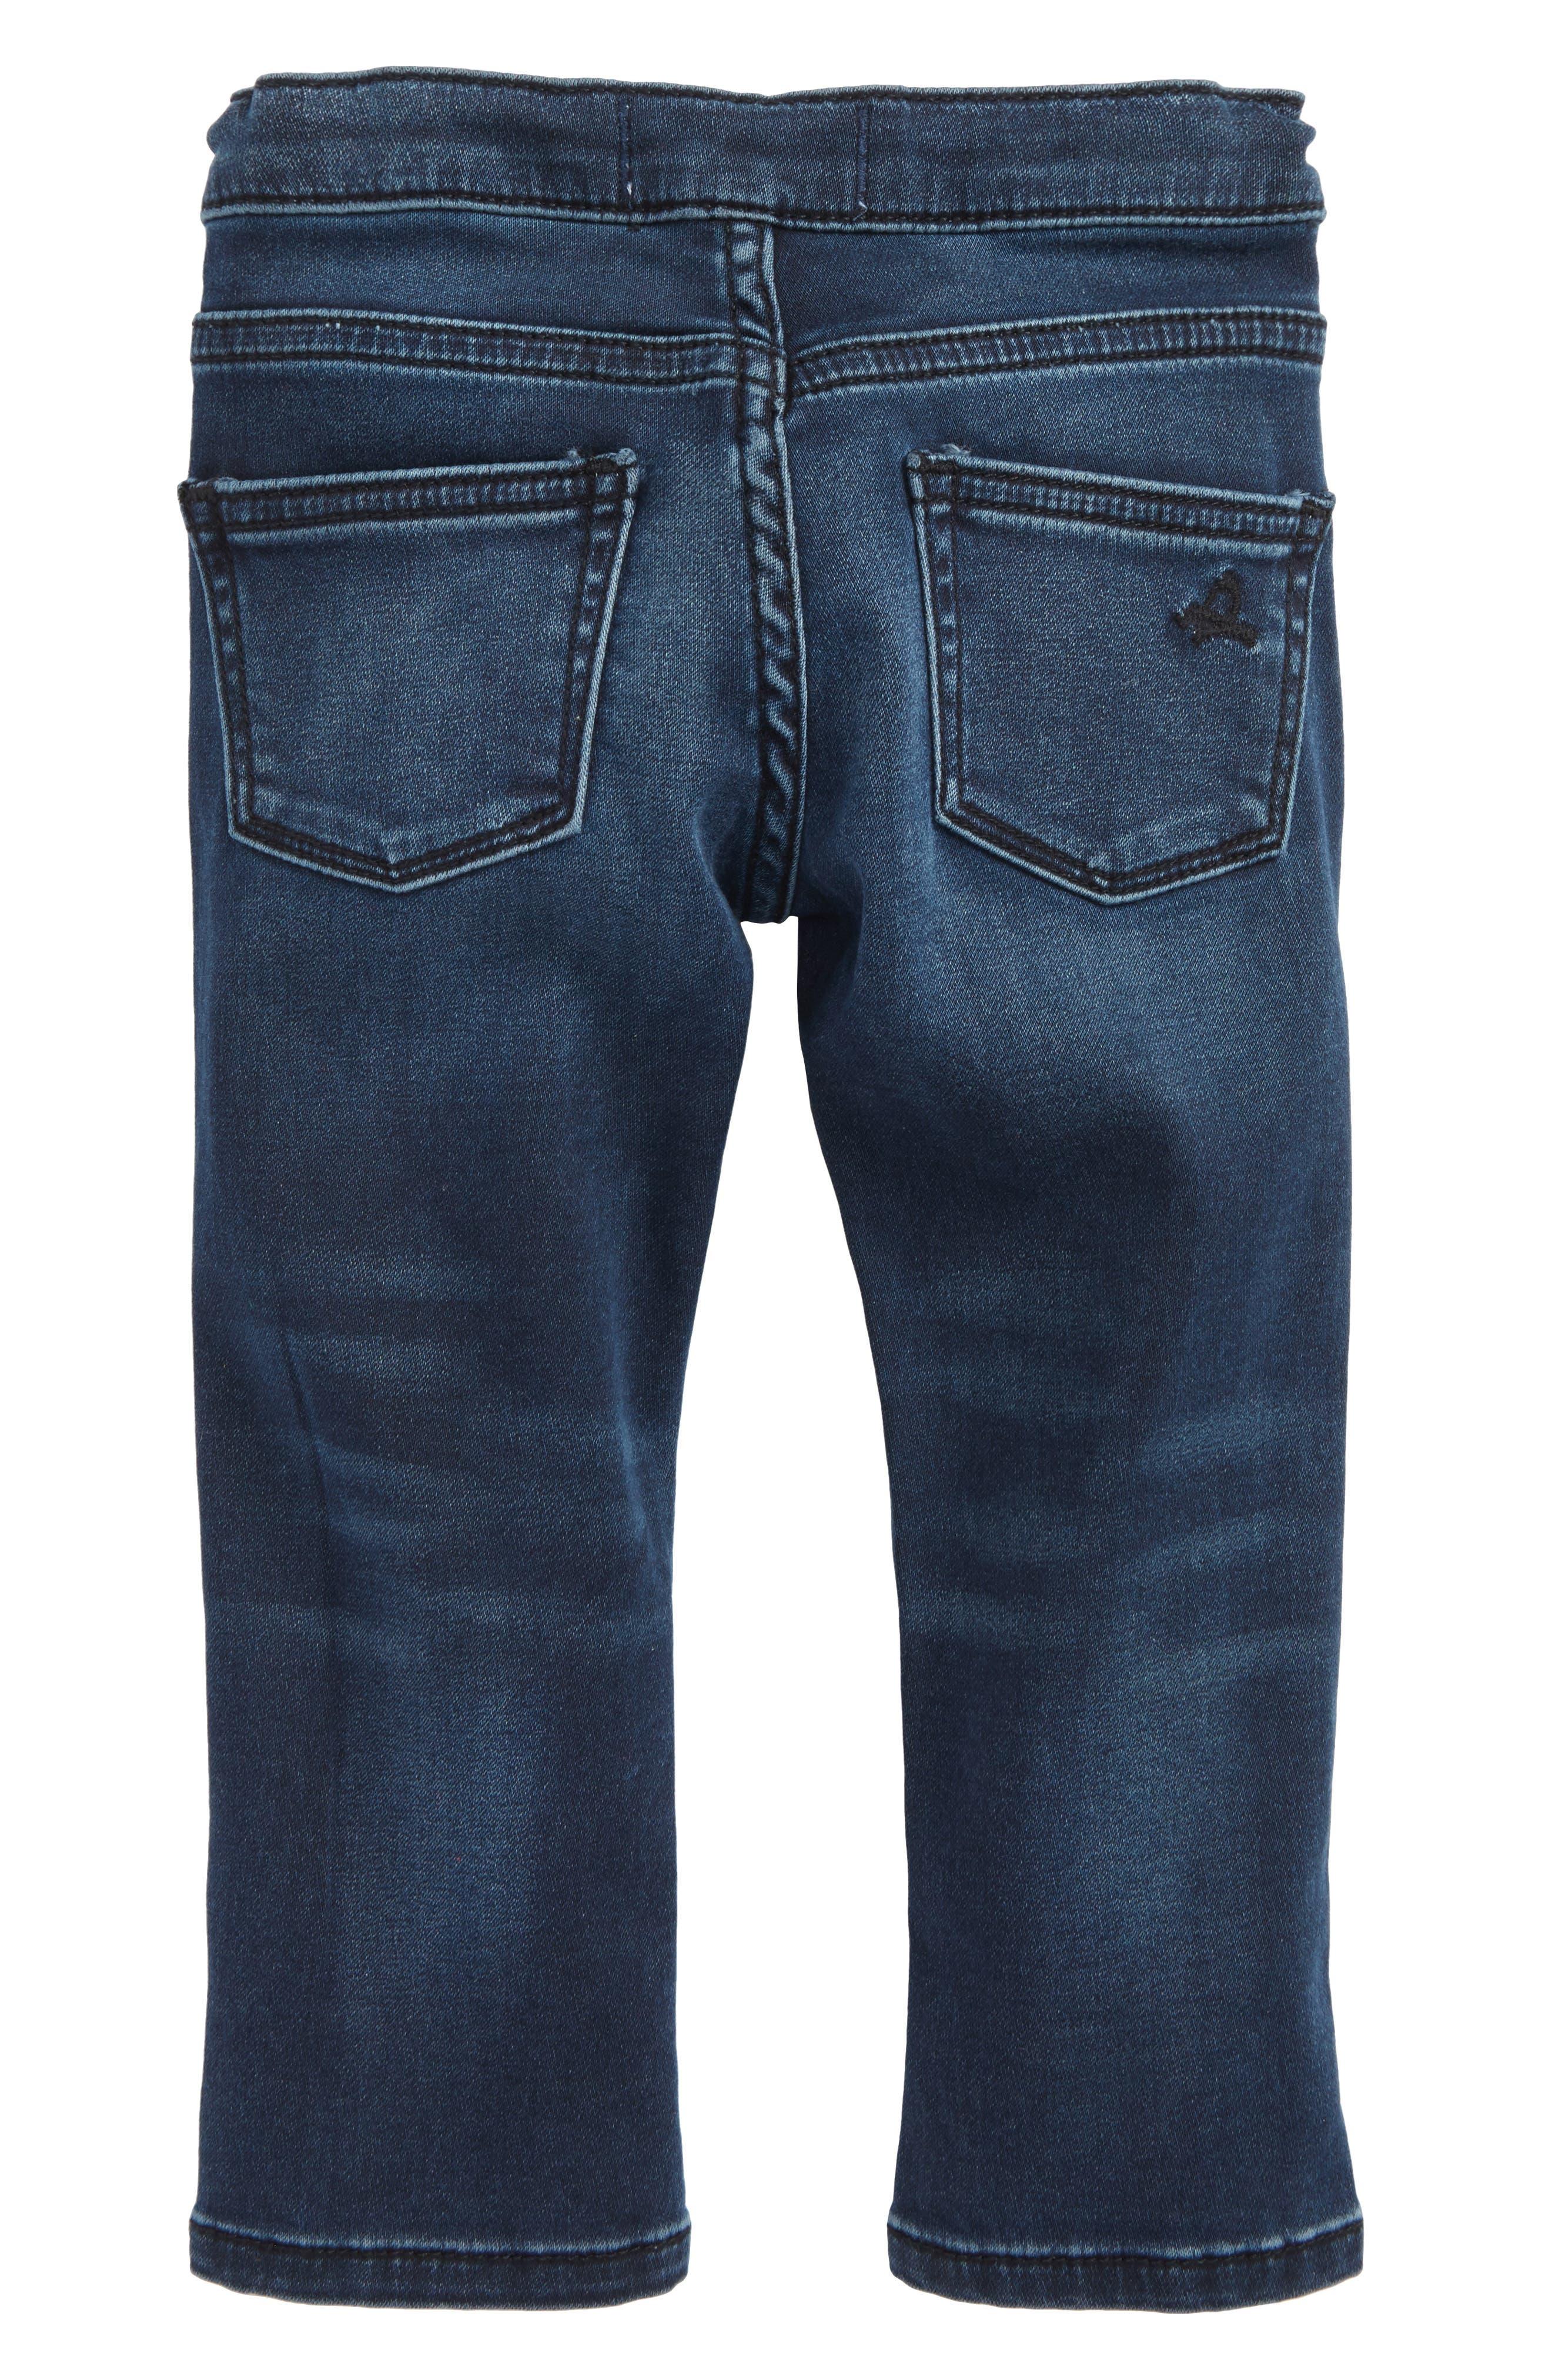 Eddy Slim Fit Jeans,                             Alternate thumbnail 2, color,                             Reserve